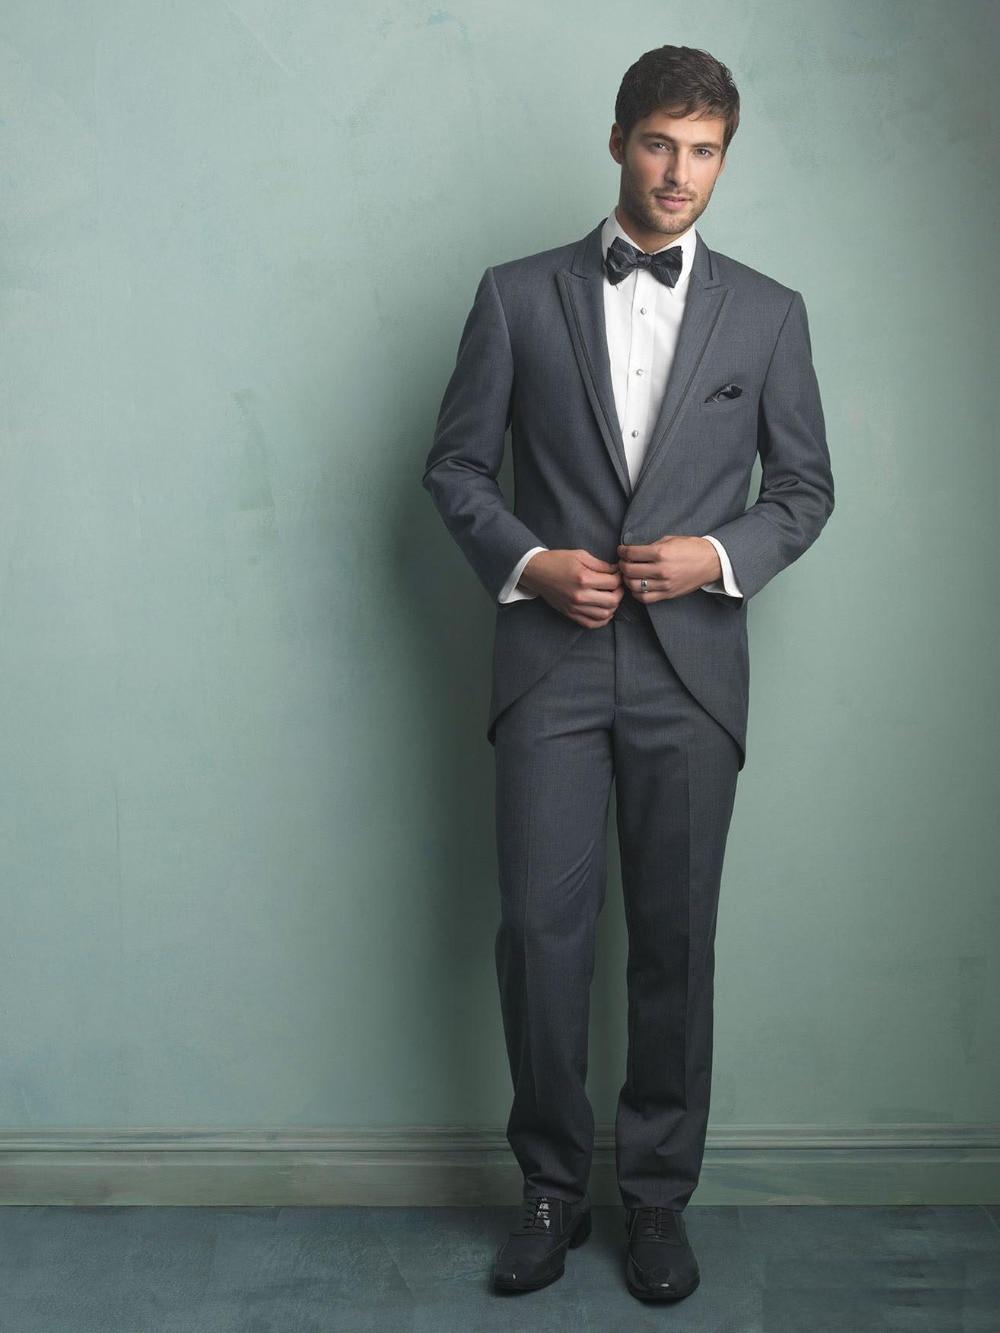 Perfect Vintage Wedding Suits For Men Frieze - All Wedding Dresses ...